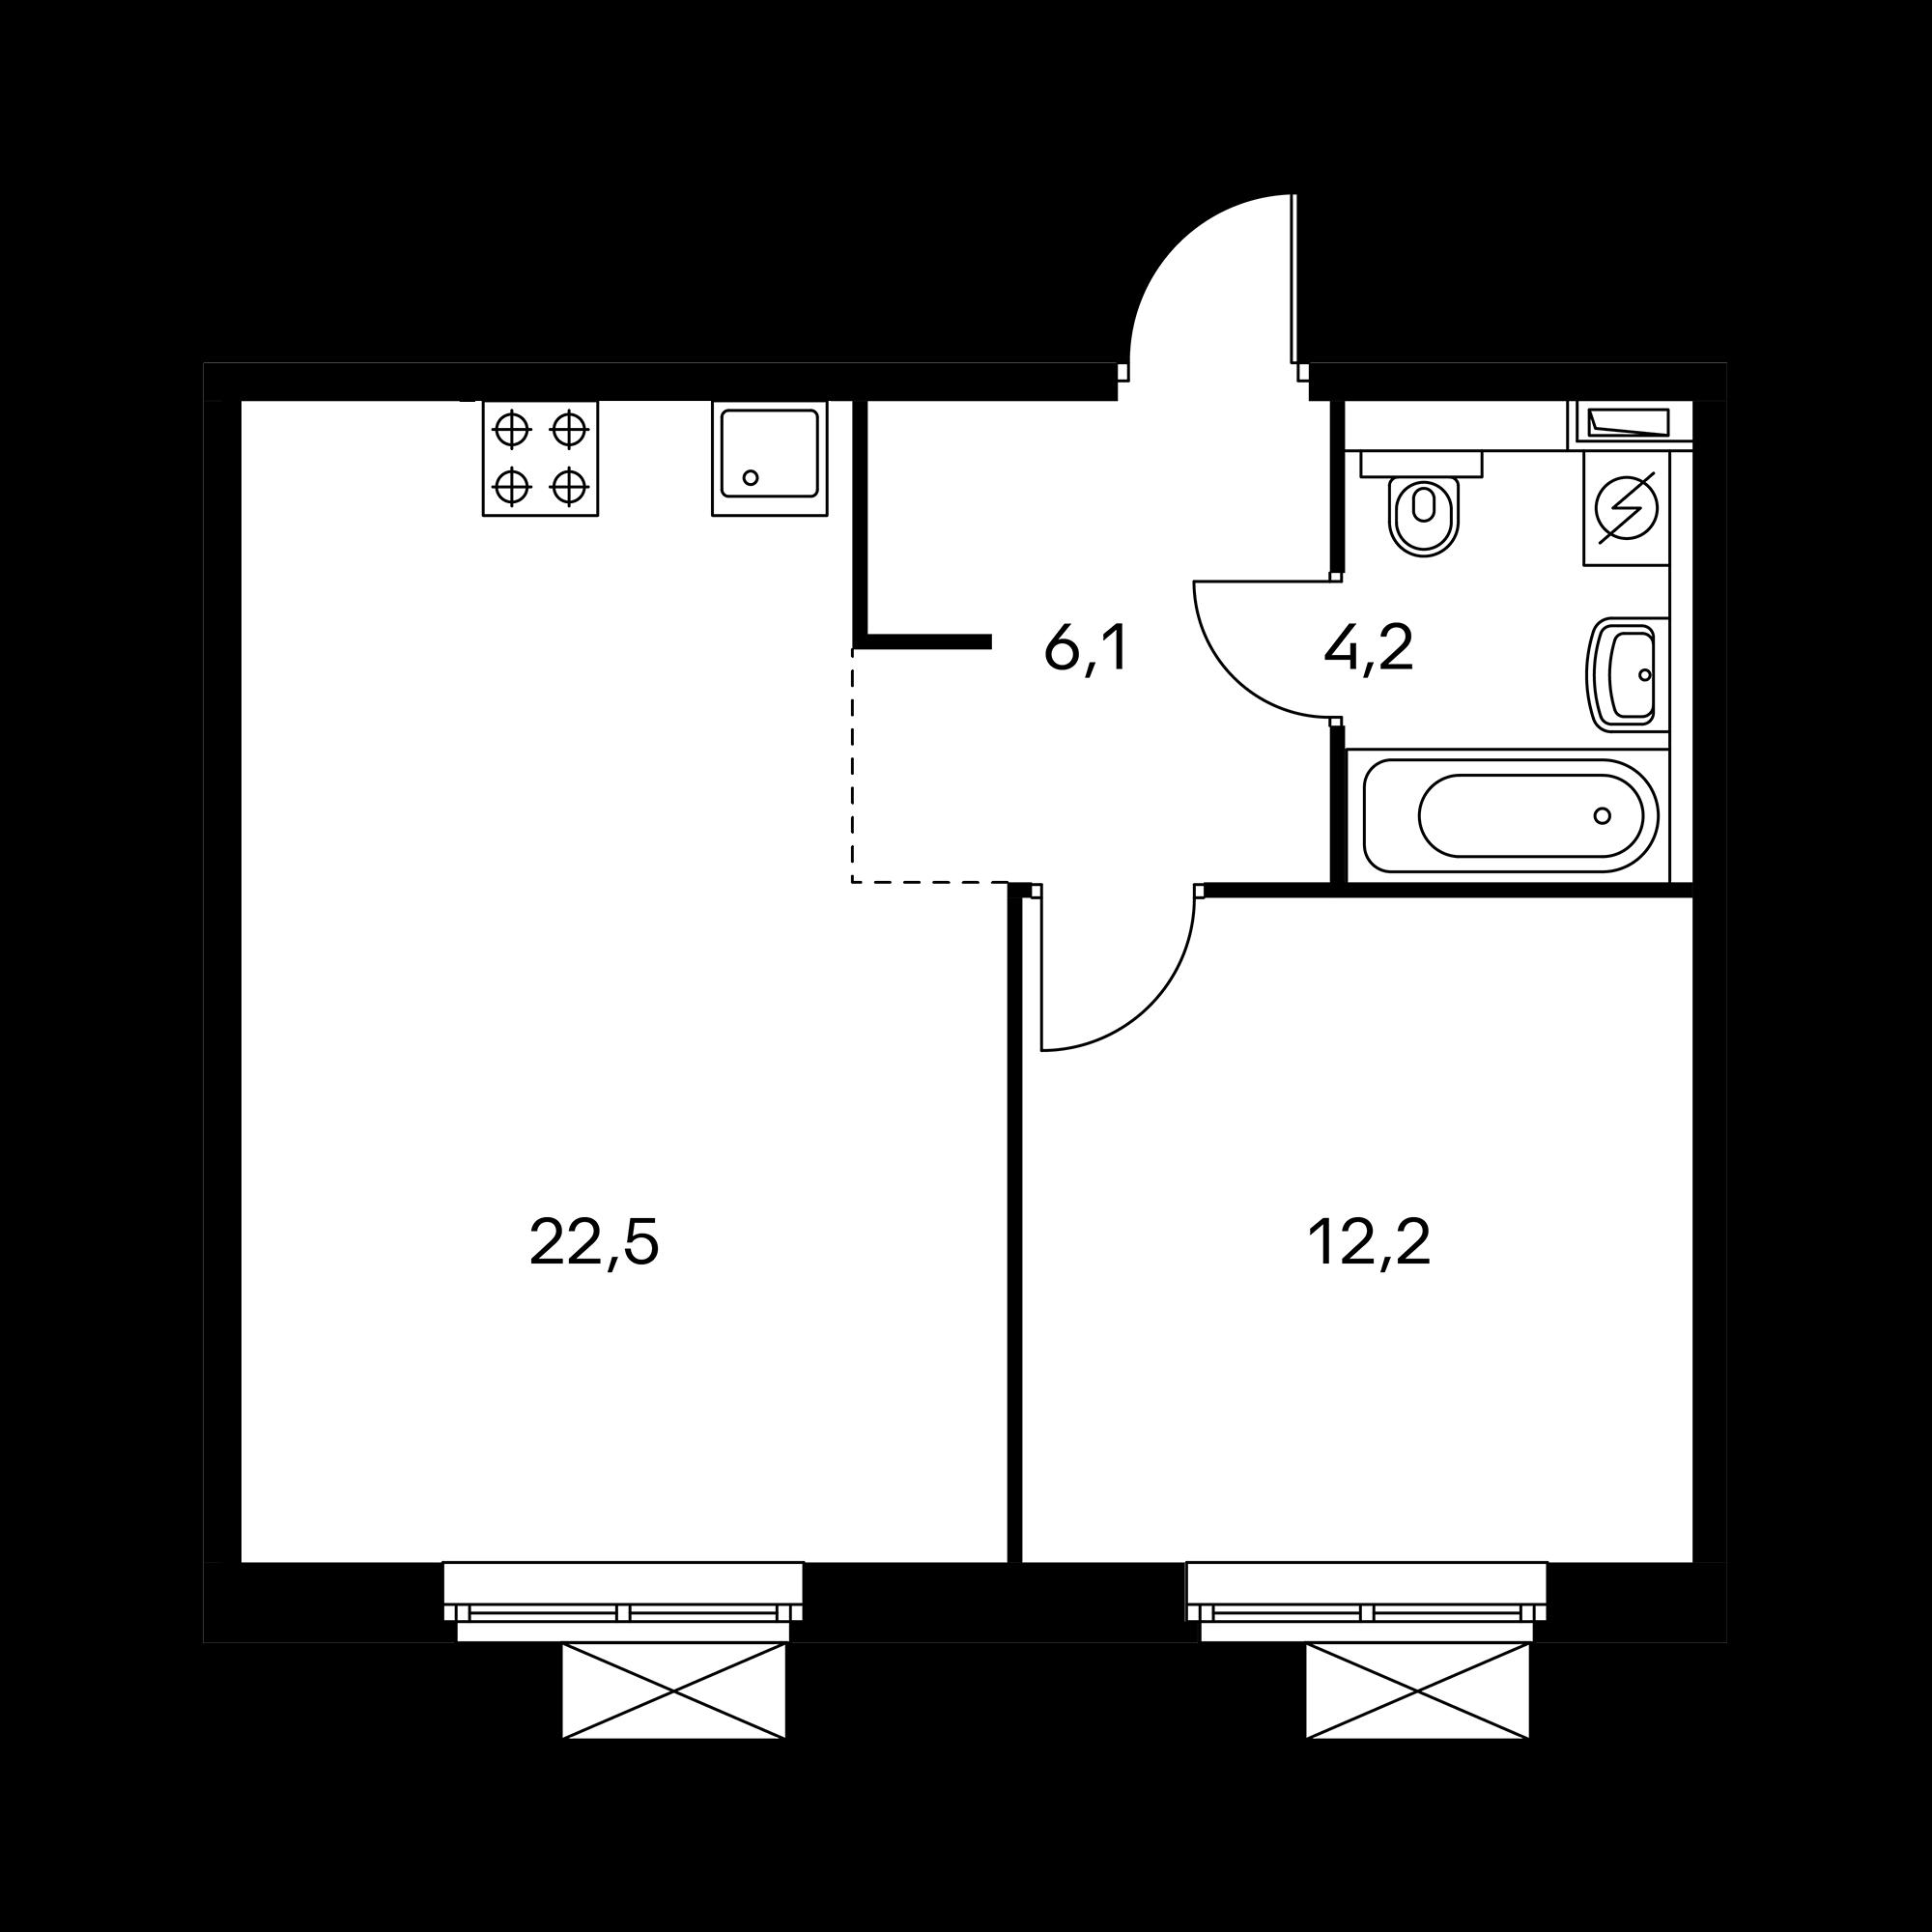 1EL3_7.8-1